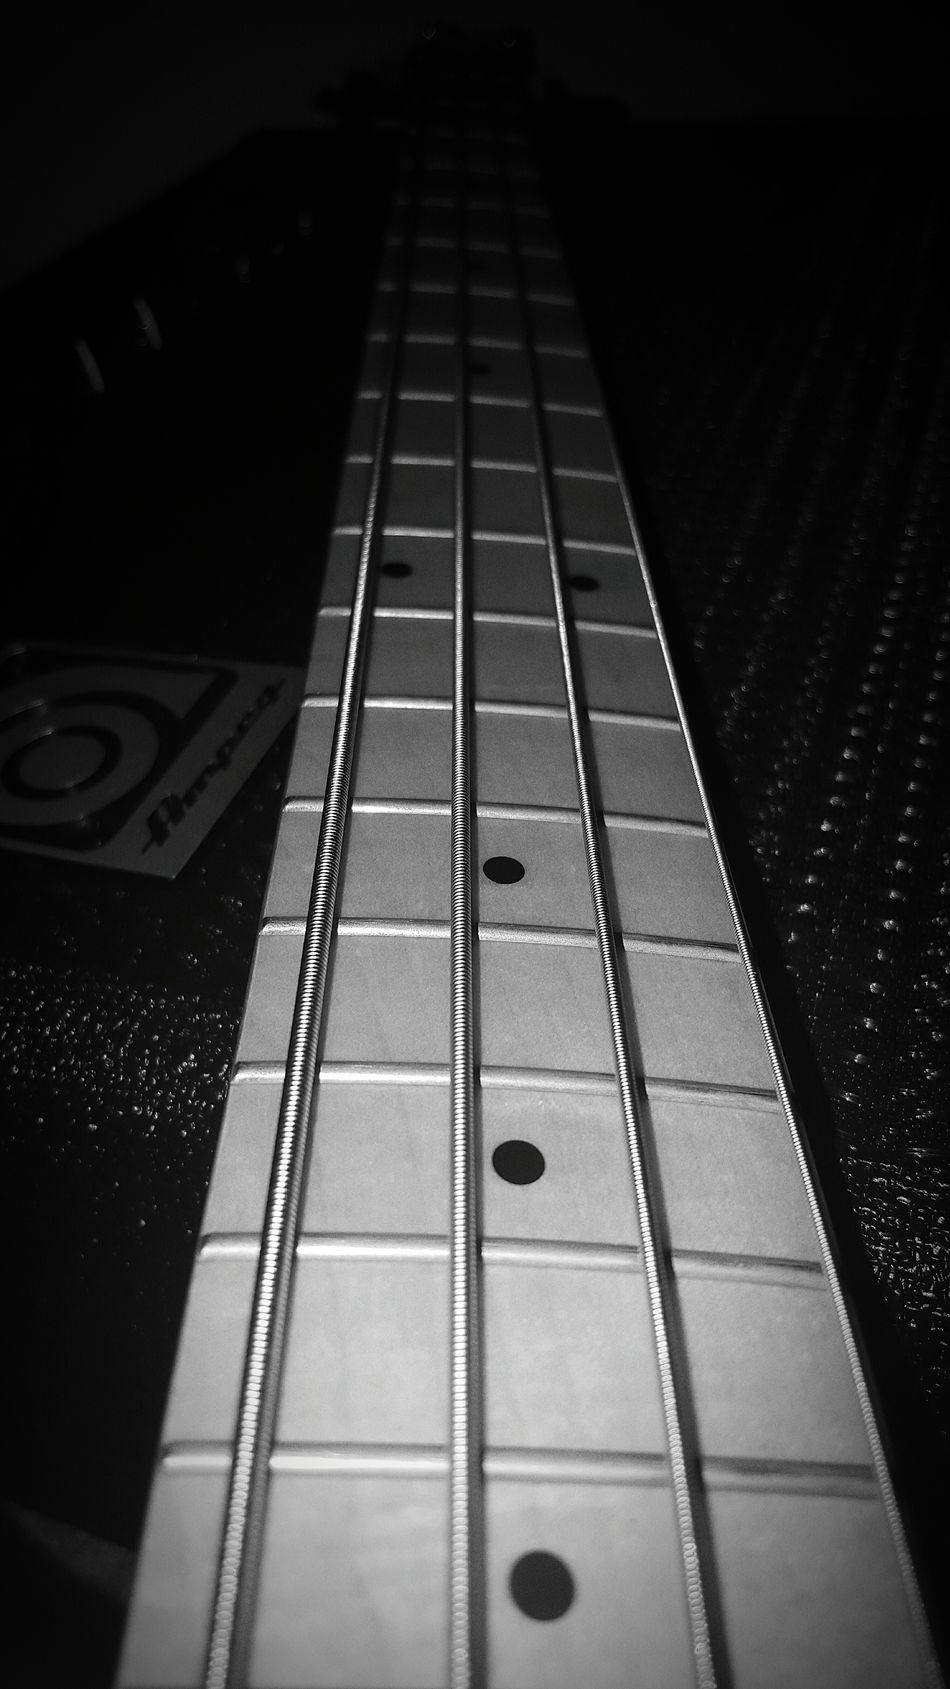 Taking Photos Enjoying Life Loveit POV Ibanez Coco's Bass Houseofguitars Hers Blackandwhite Coco'sPics Bass Guitar Amplifier Ampeg Bass Amplifier Bass Guitar EyeEm Best Shots - Black + White